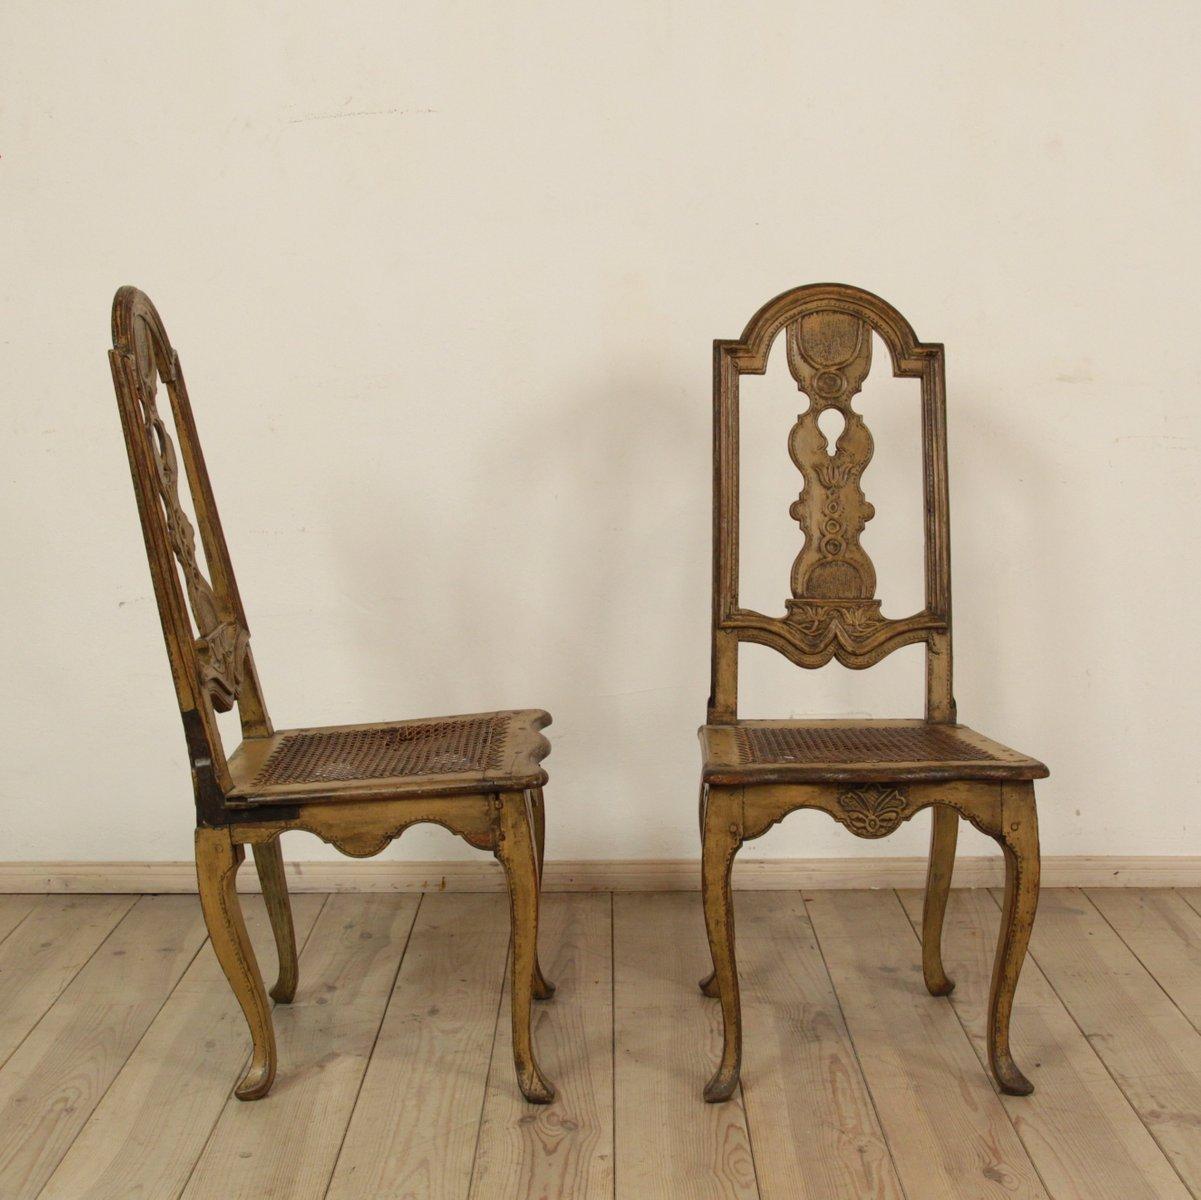 Antique Swedish Baroque Chairs, Set of 2 - Antique Swedish Baroque Chairs, Set Of 2 For Sale At Pamono